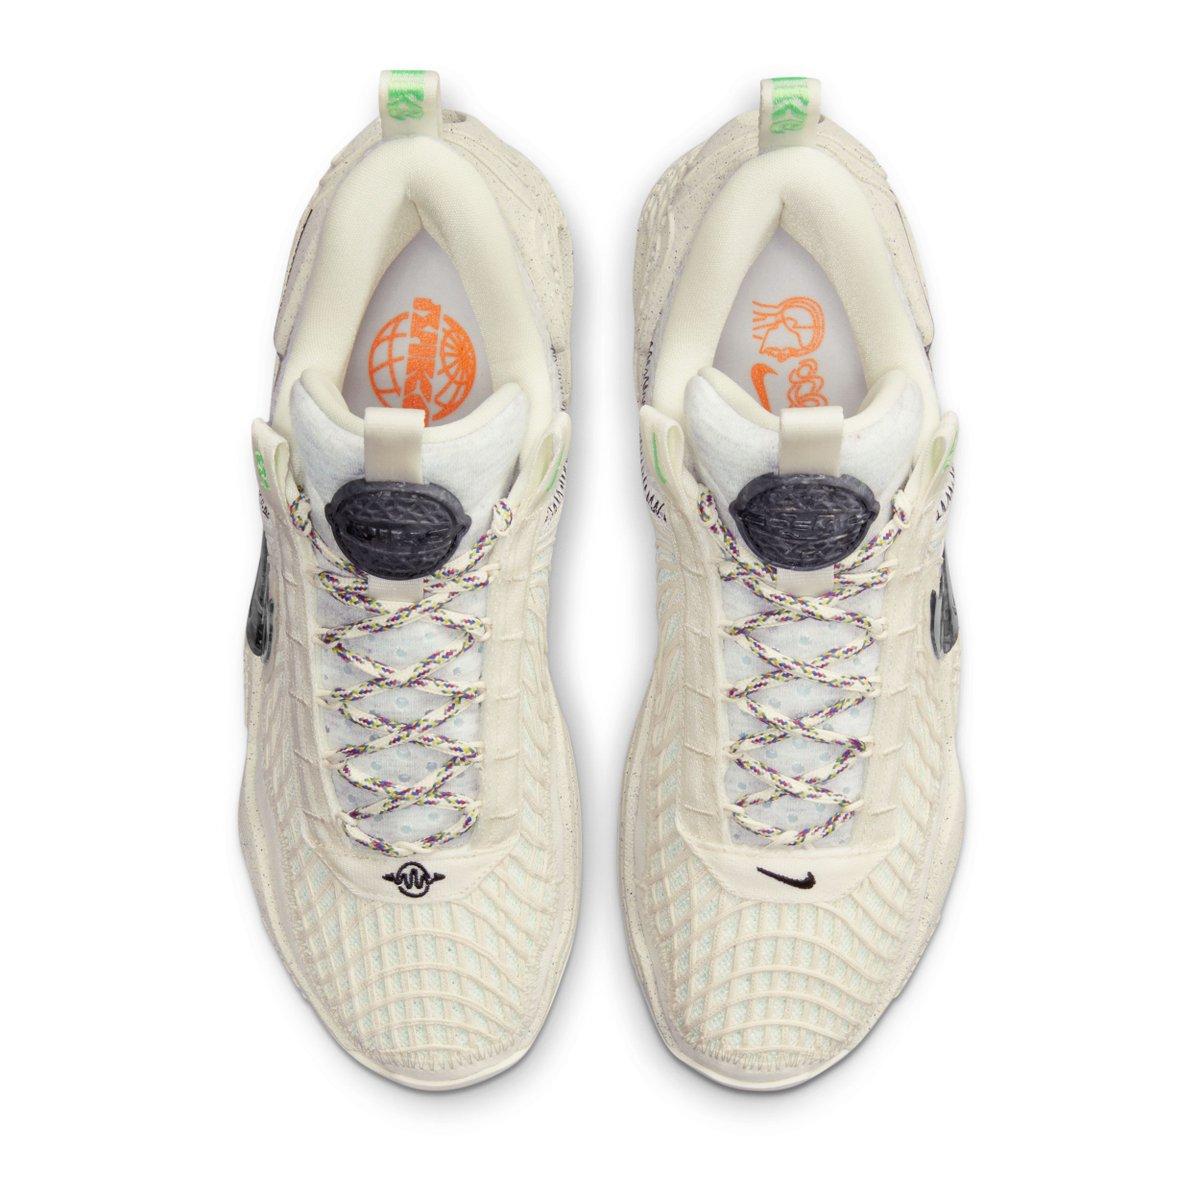 Nike,Cosmic Unity,曝光  这颜值有点顶!Nike 环保篮球鞋新配色曝光!